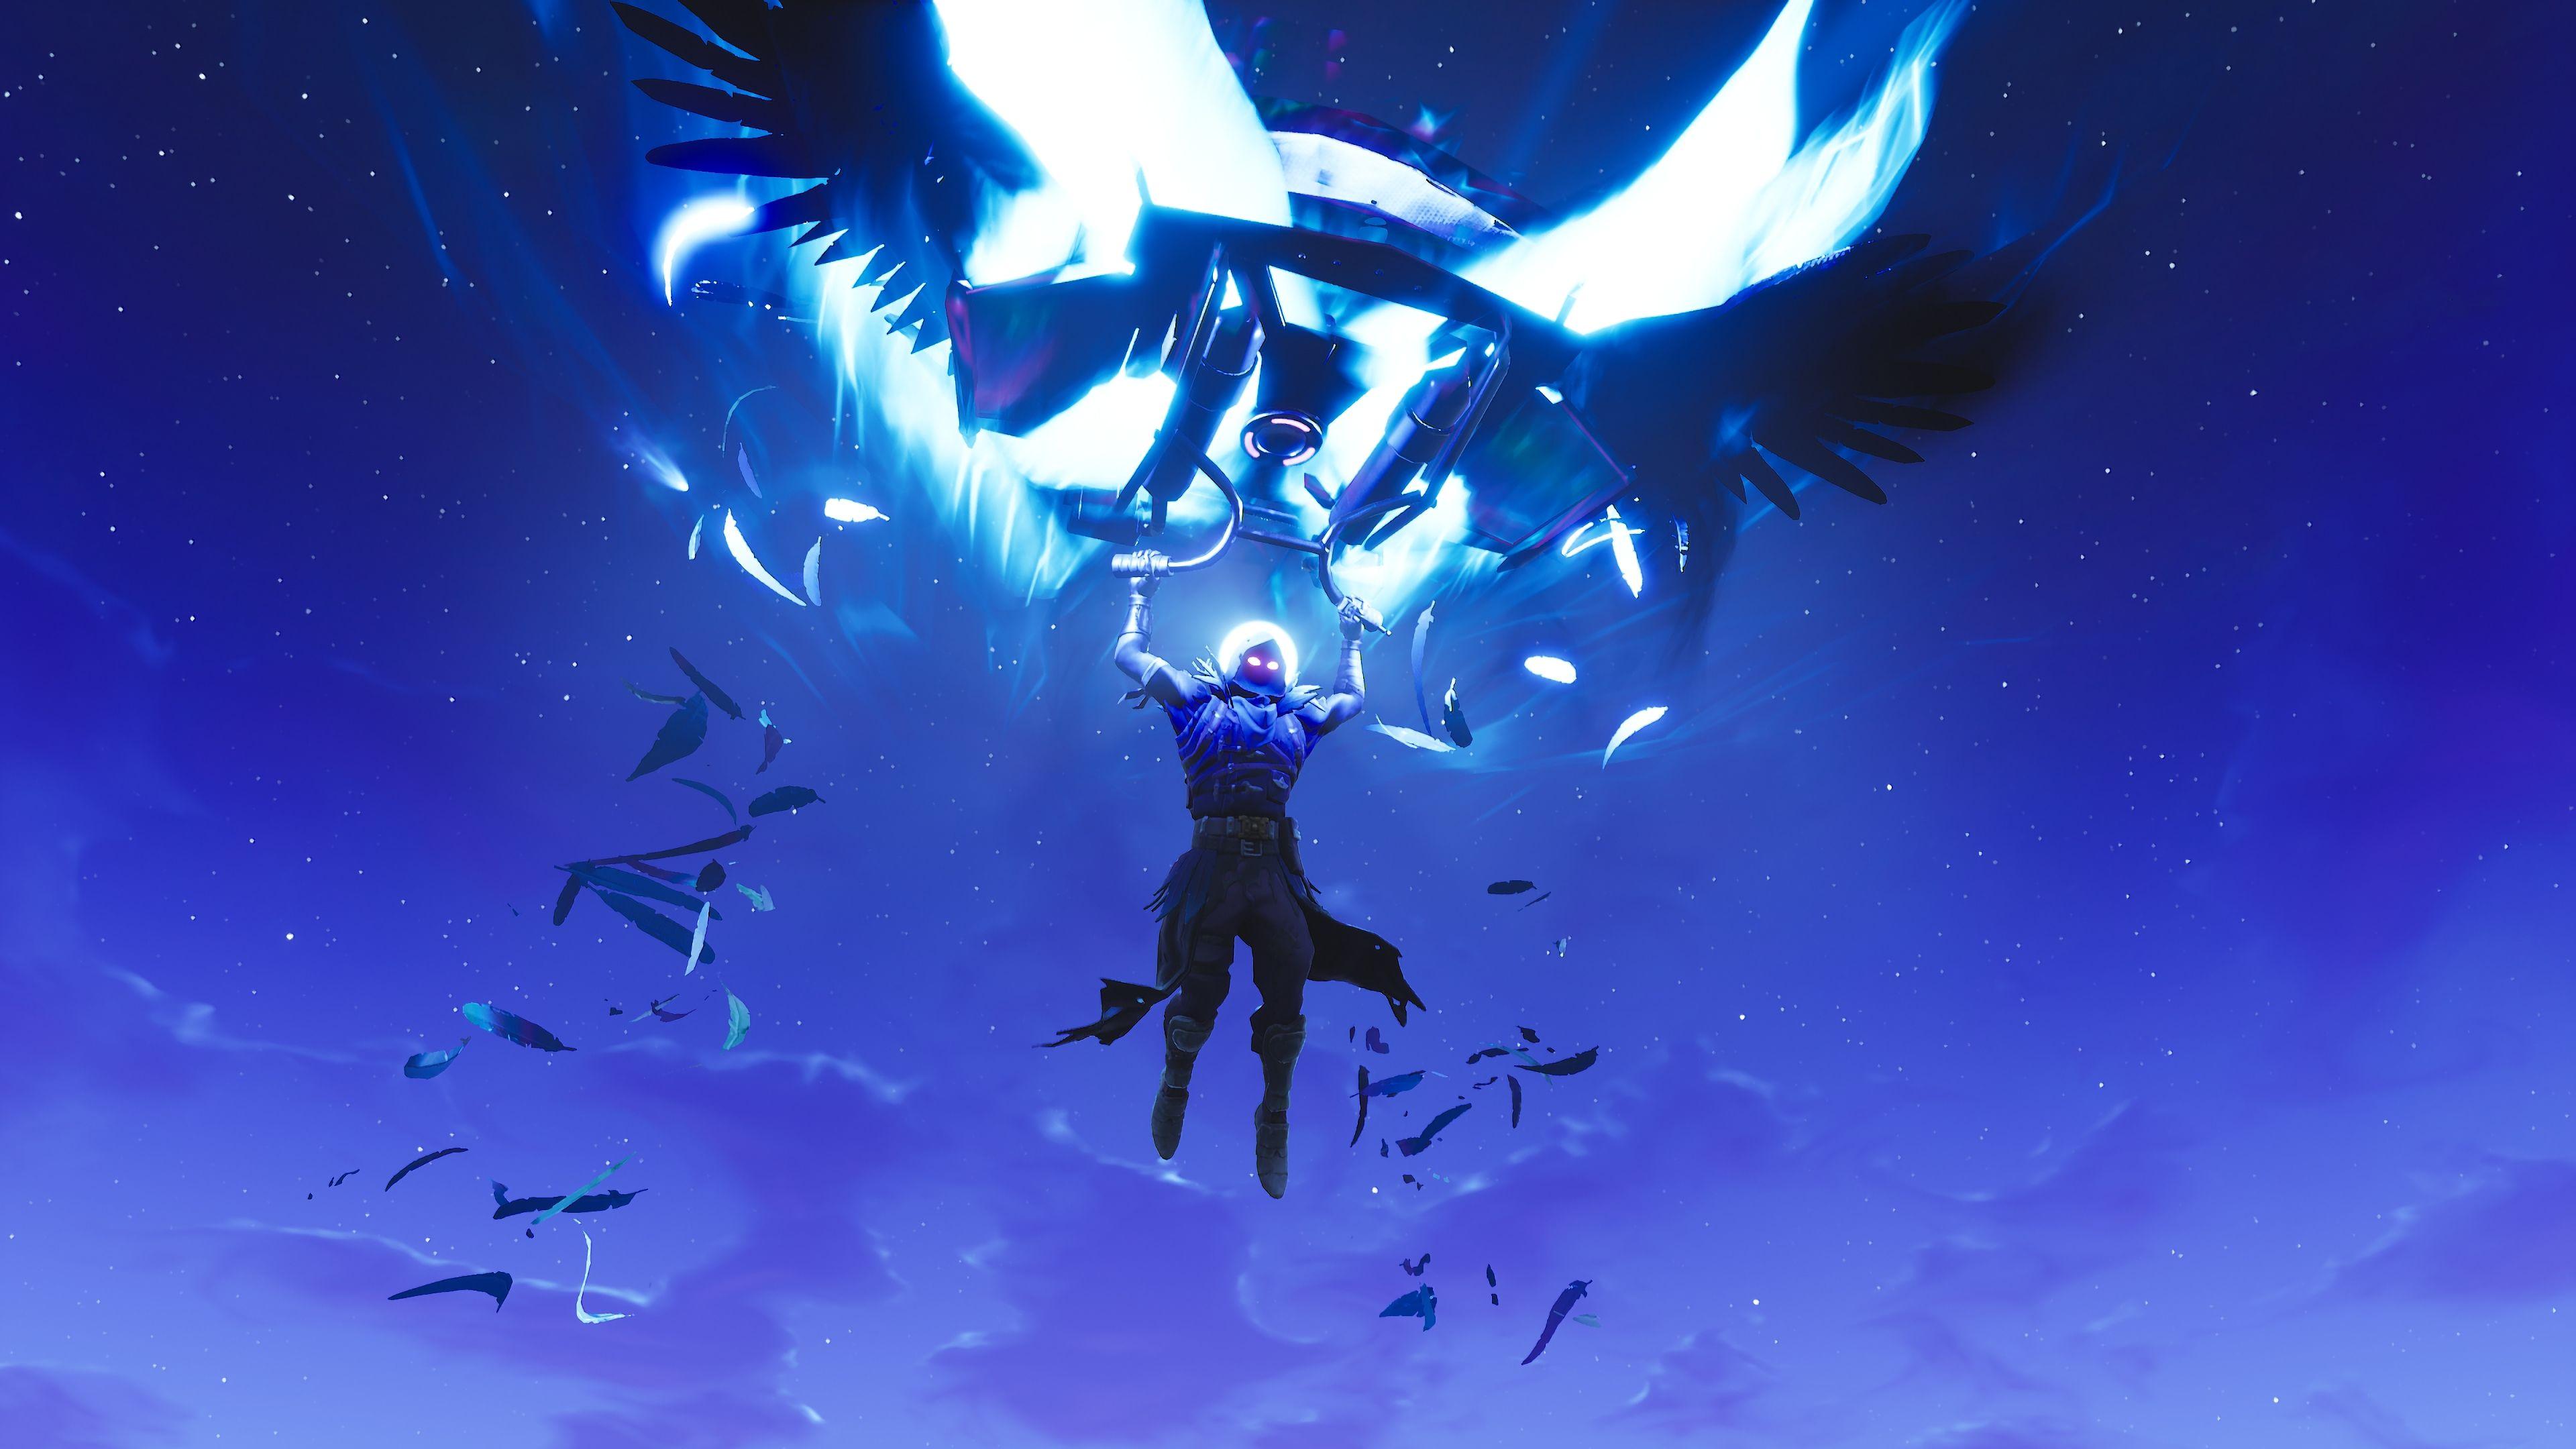 Raven Feathered Flyer Glider Fortnite Battle Royale Video Game